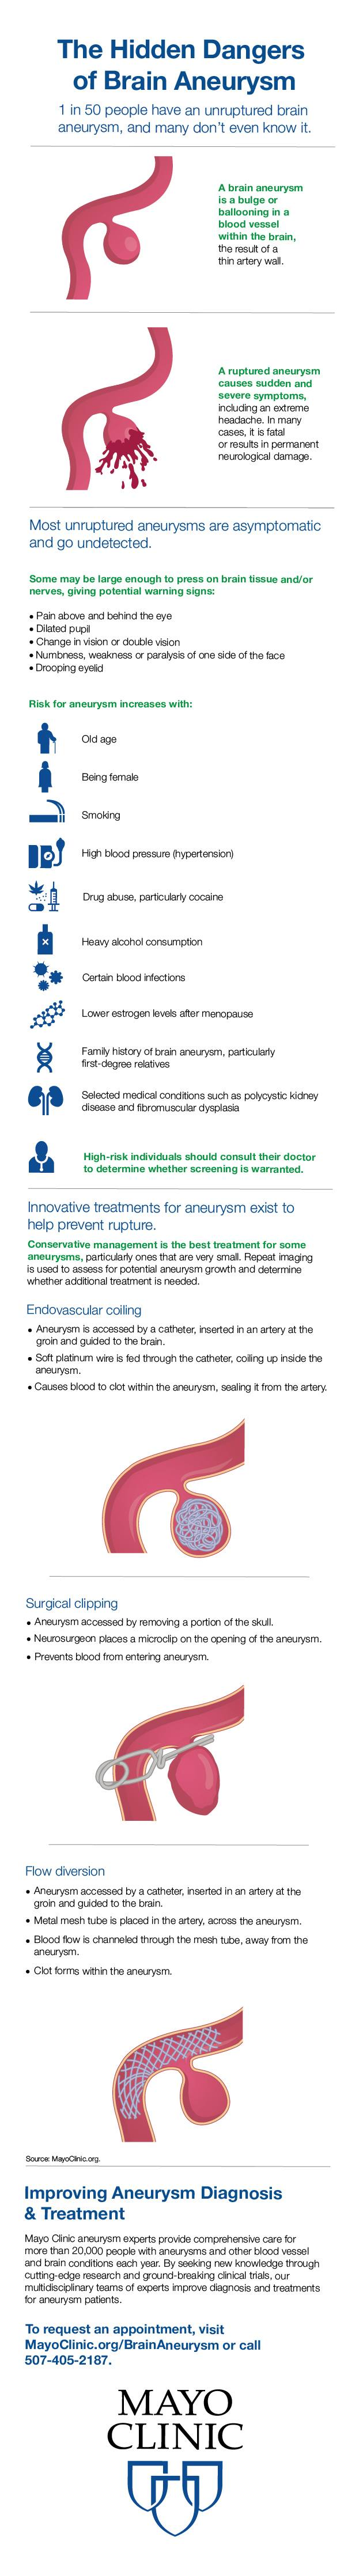 Brain Aneurysm infographic